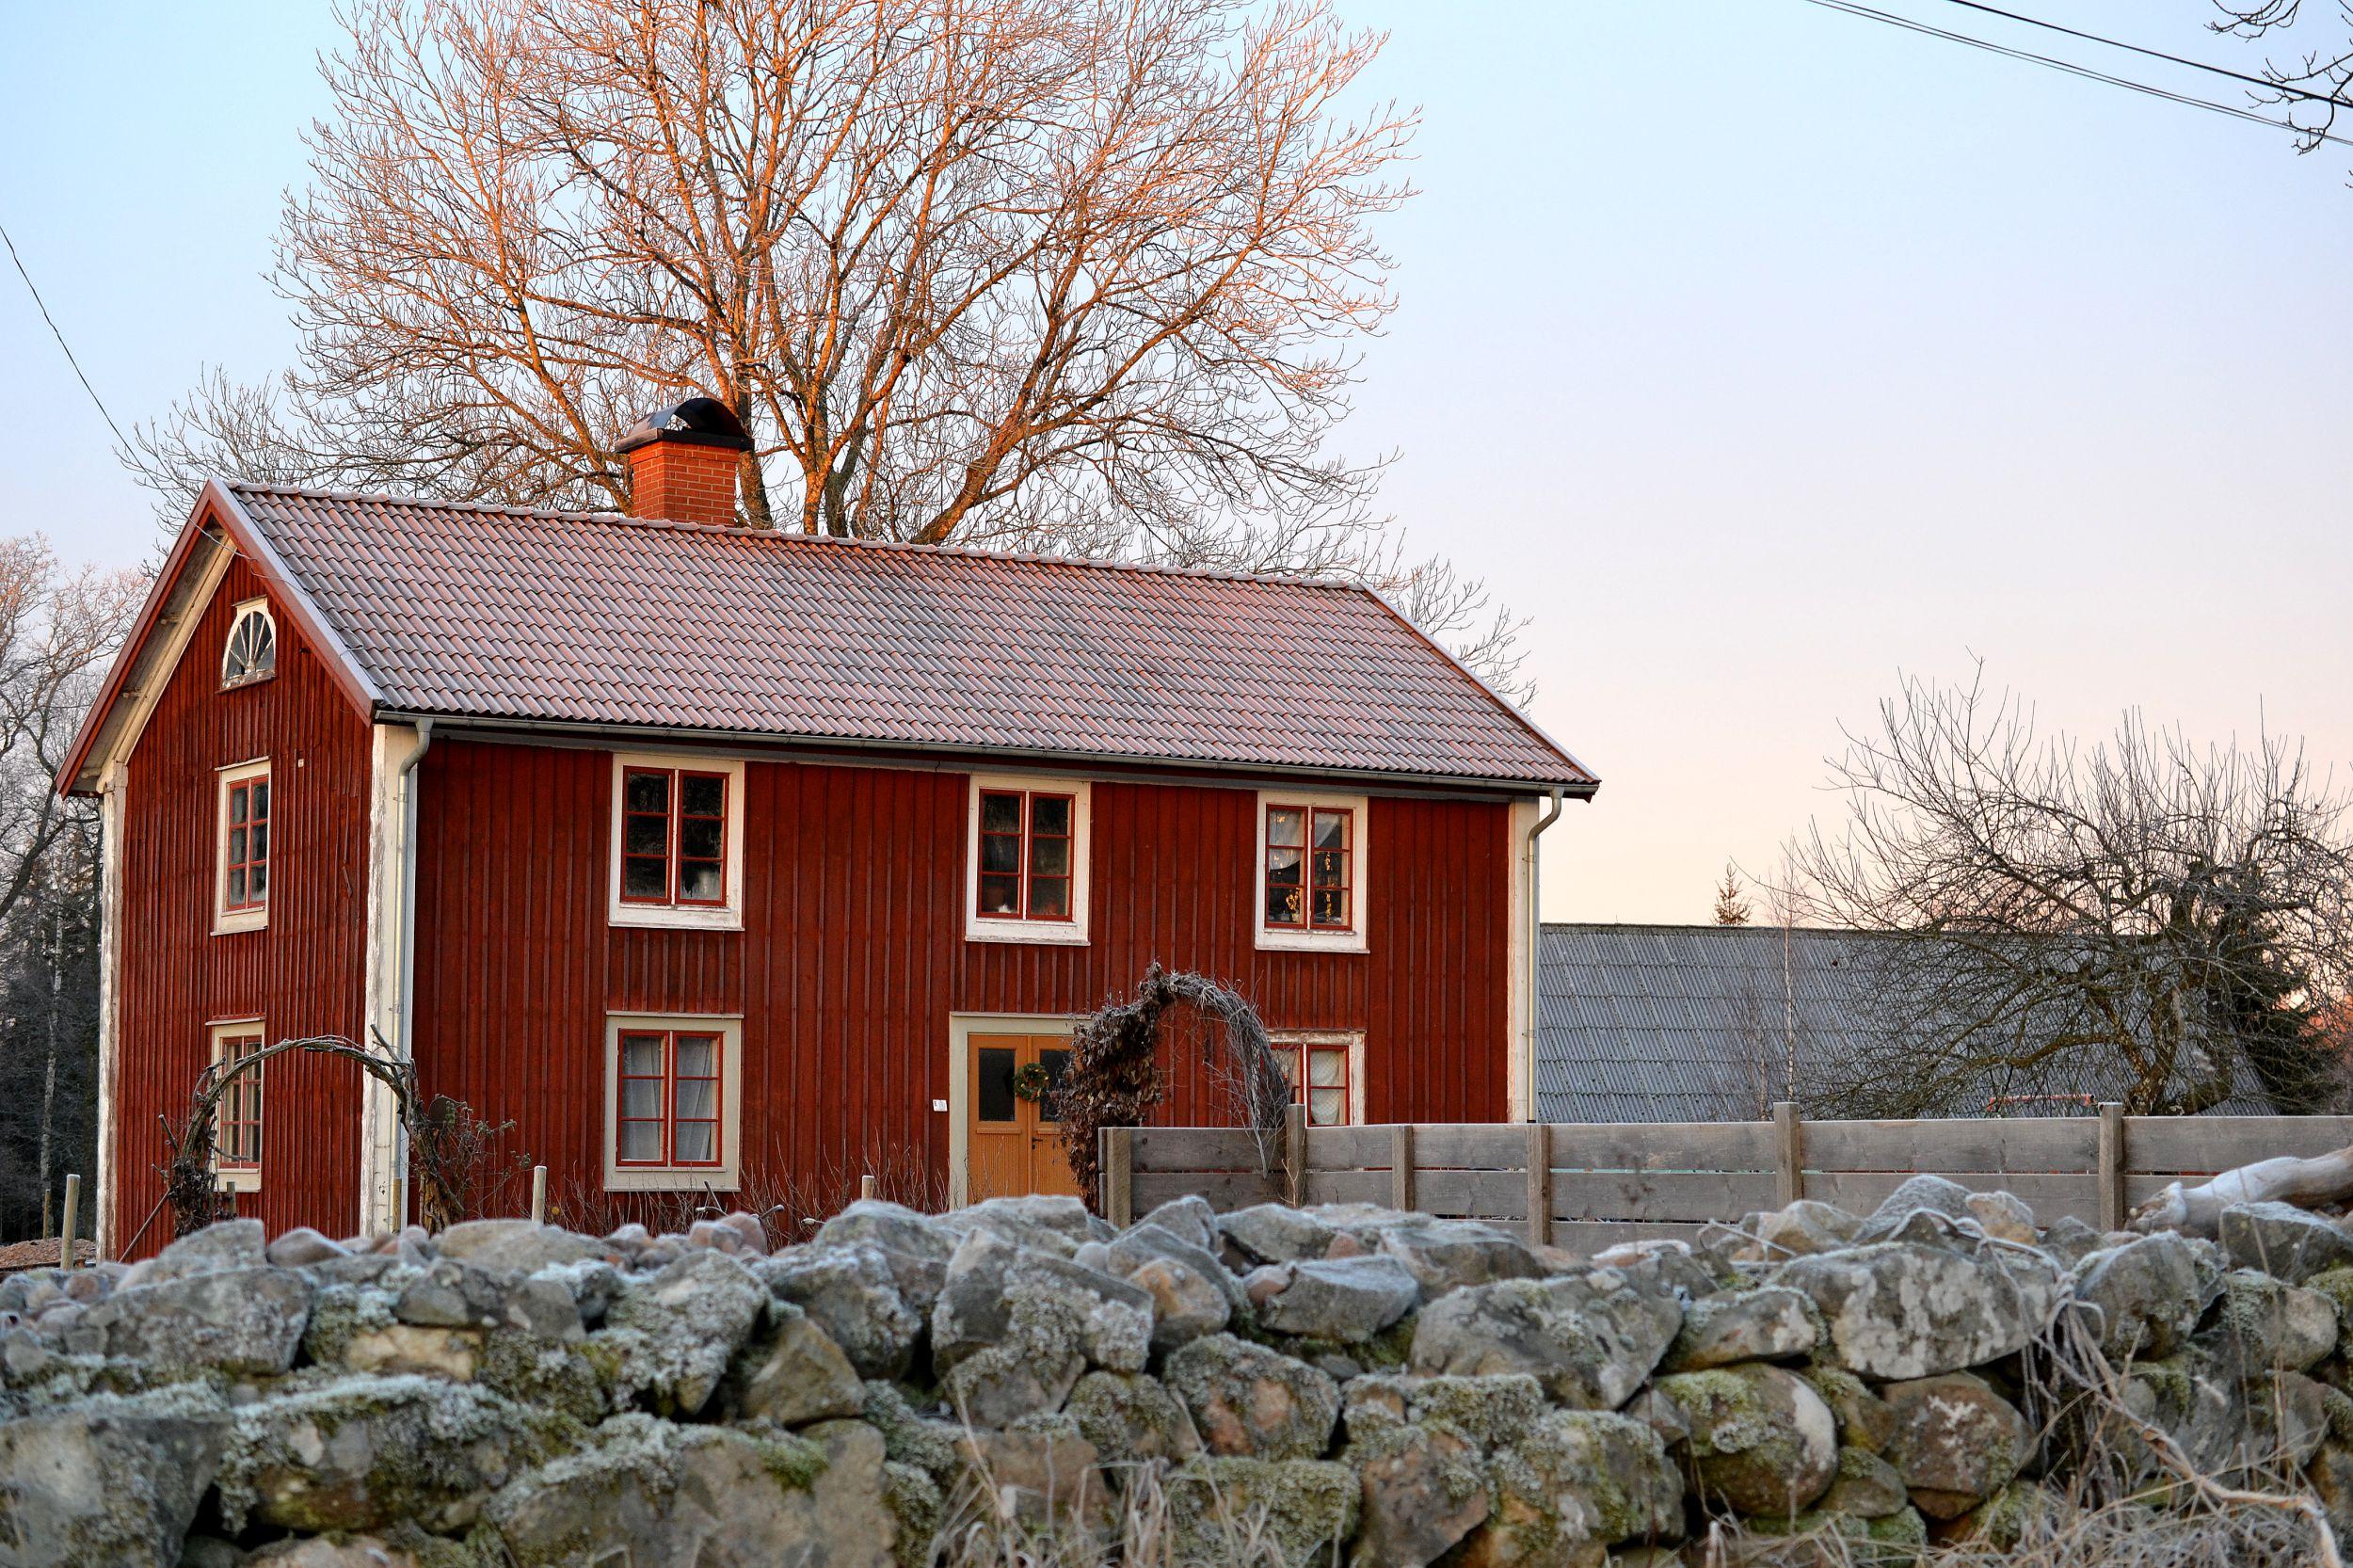 Huset Skillnadens i vinterljus med lite frost på stenmuren.